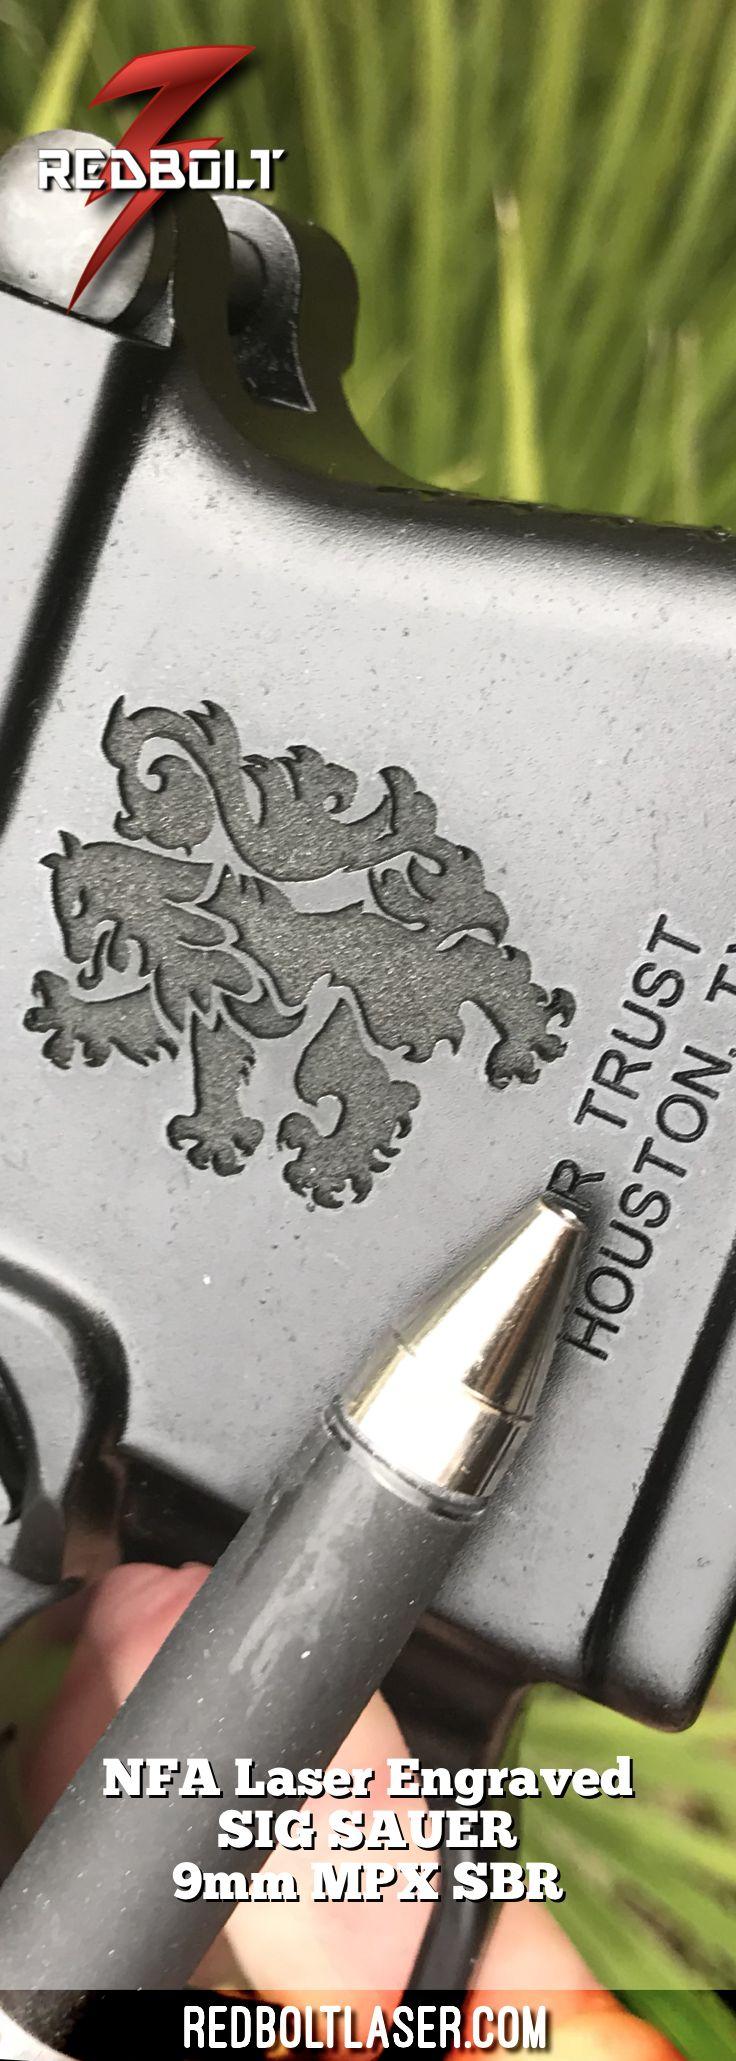 Custom Deep Laser Engraved SIG SAUER 9mm MPX SBR with NFA Trust and Black Lion #redbolt #redboltlaser #guns #sigsauer #sig #pewpew #nfa #sbr